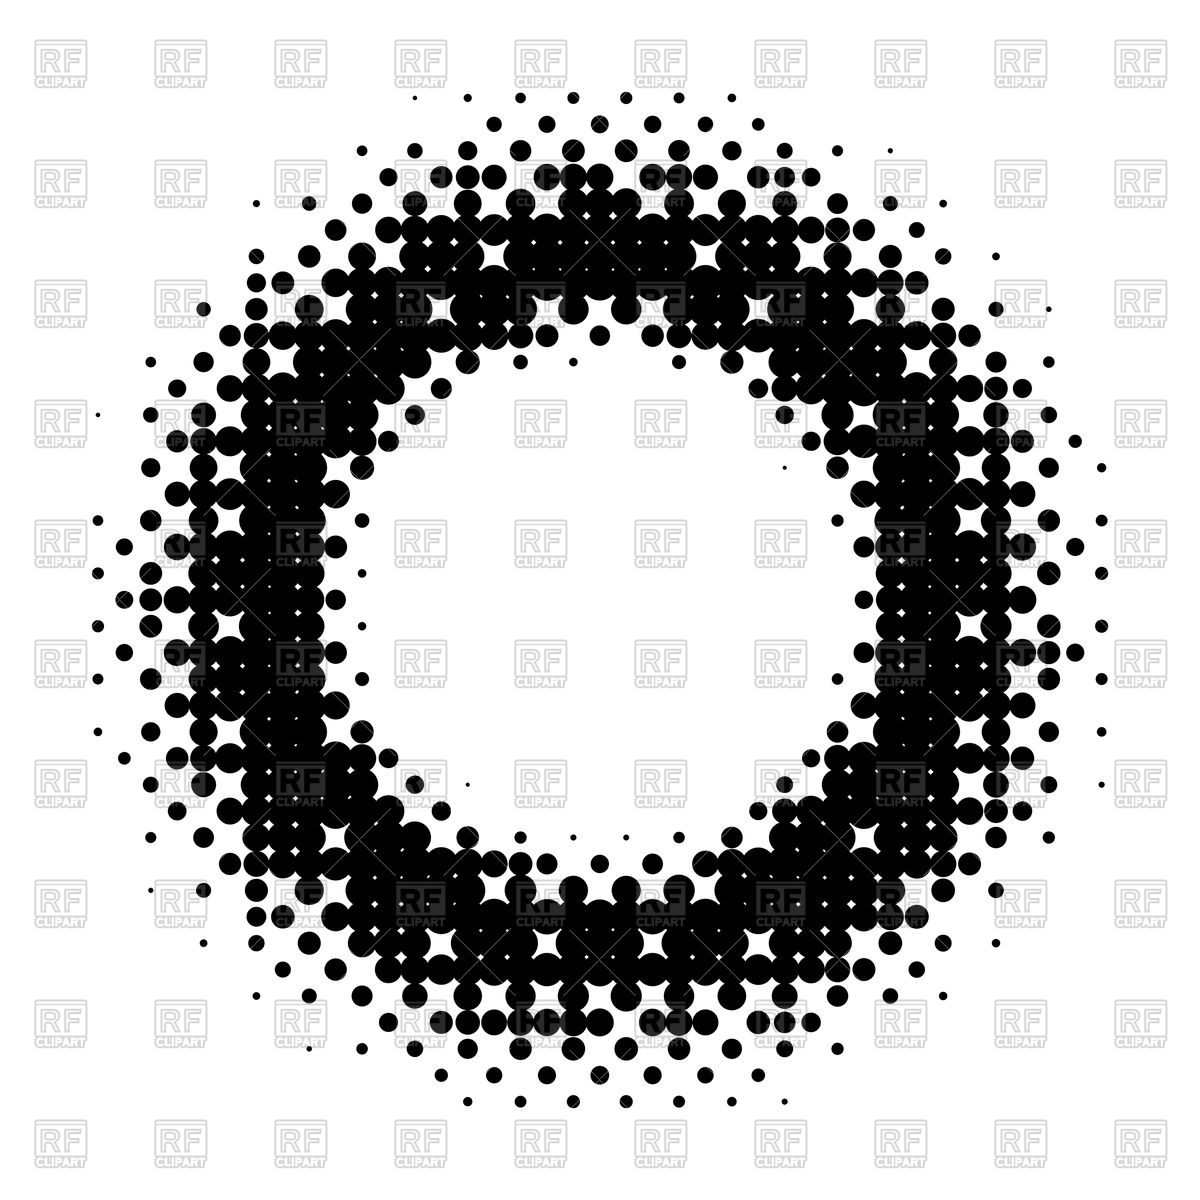 1200x1200 Halftone Circle Design Vector Image Vector Artwork Of Design